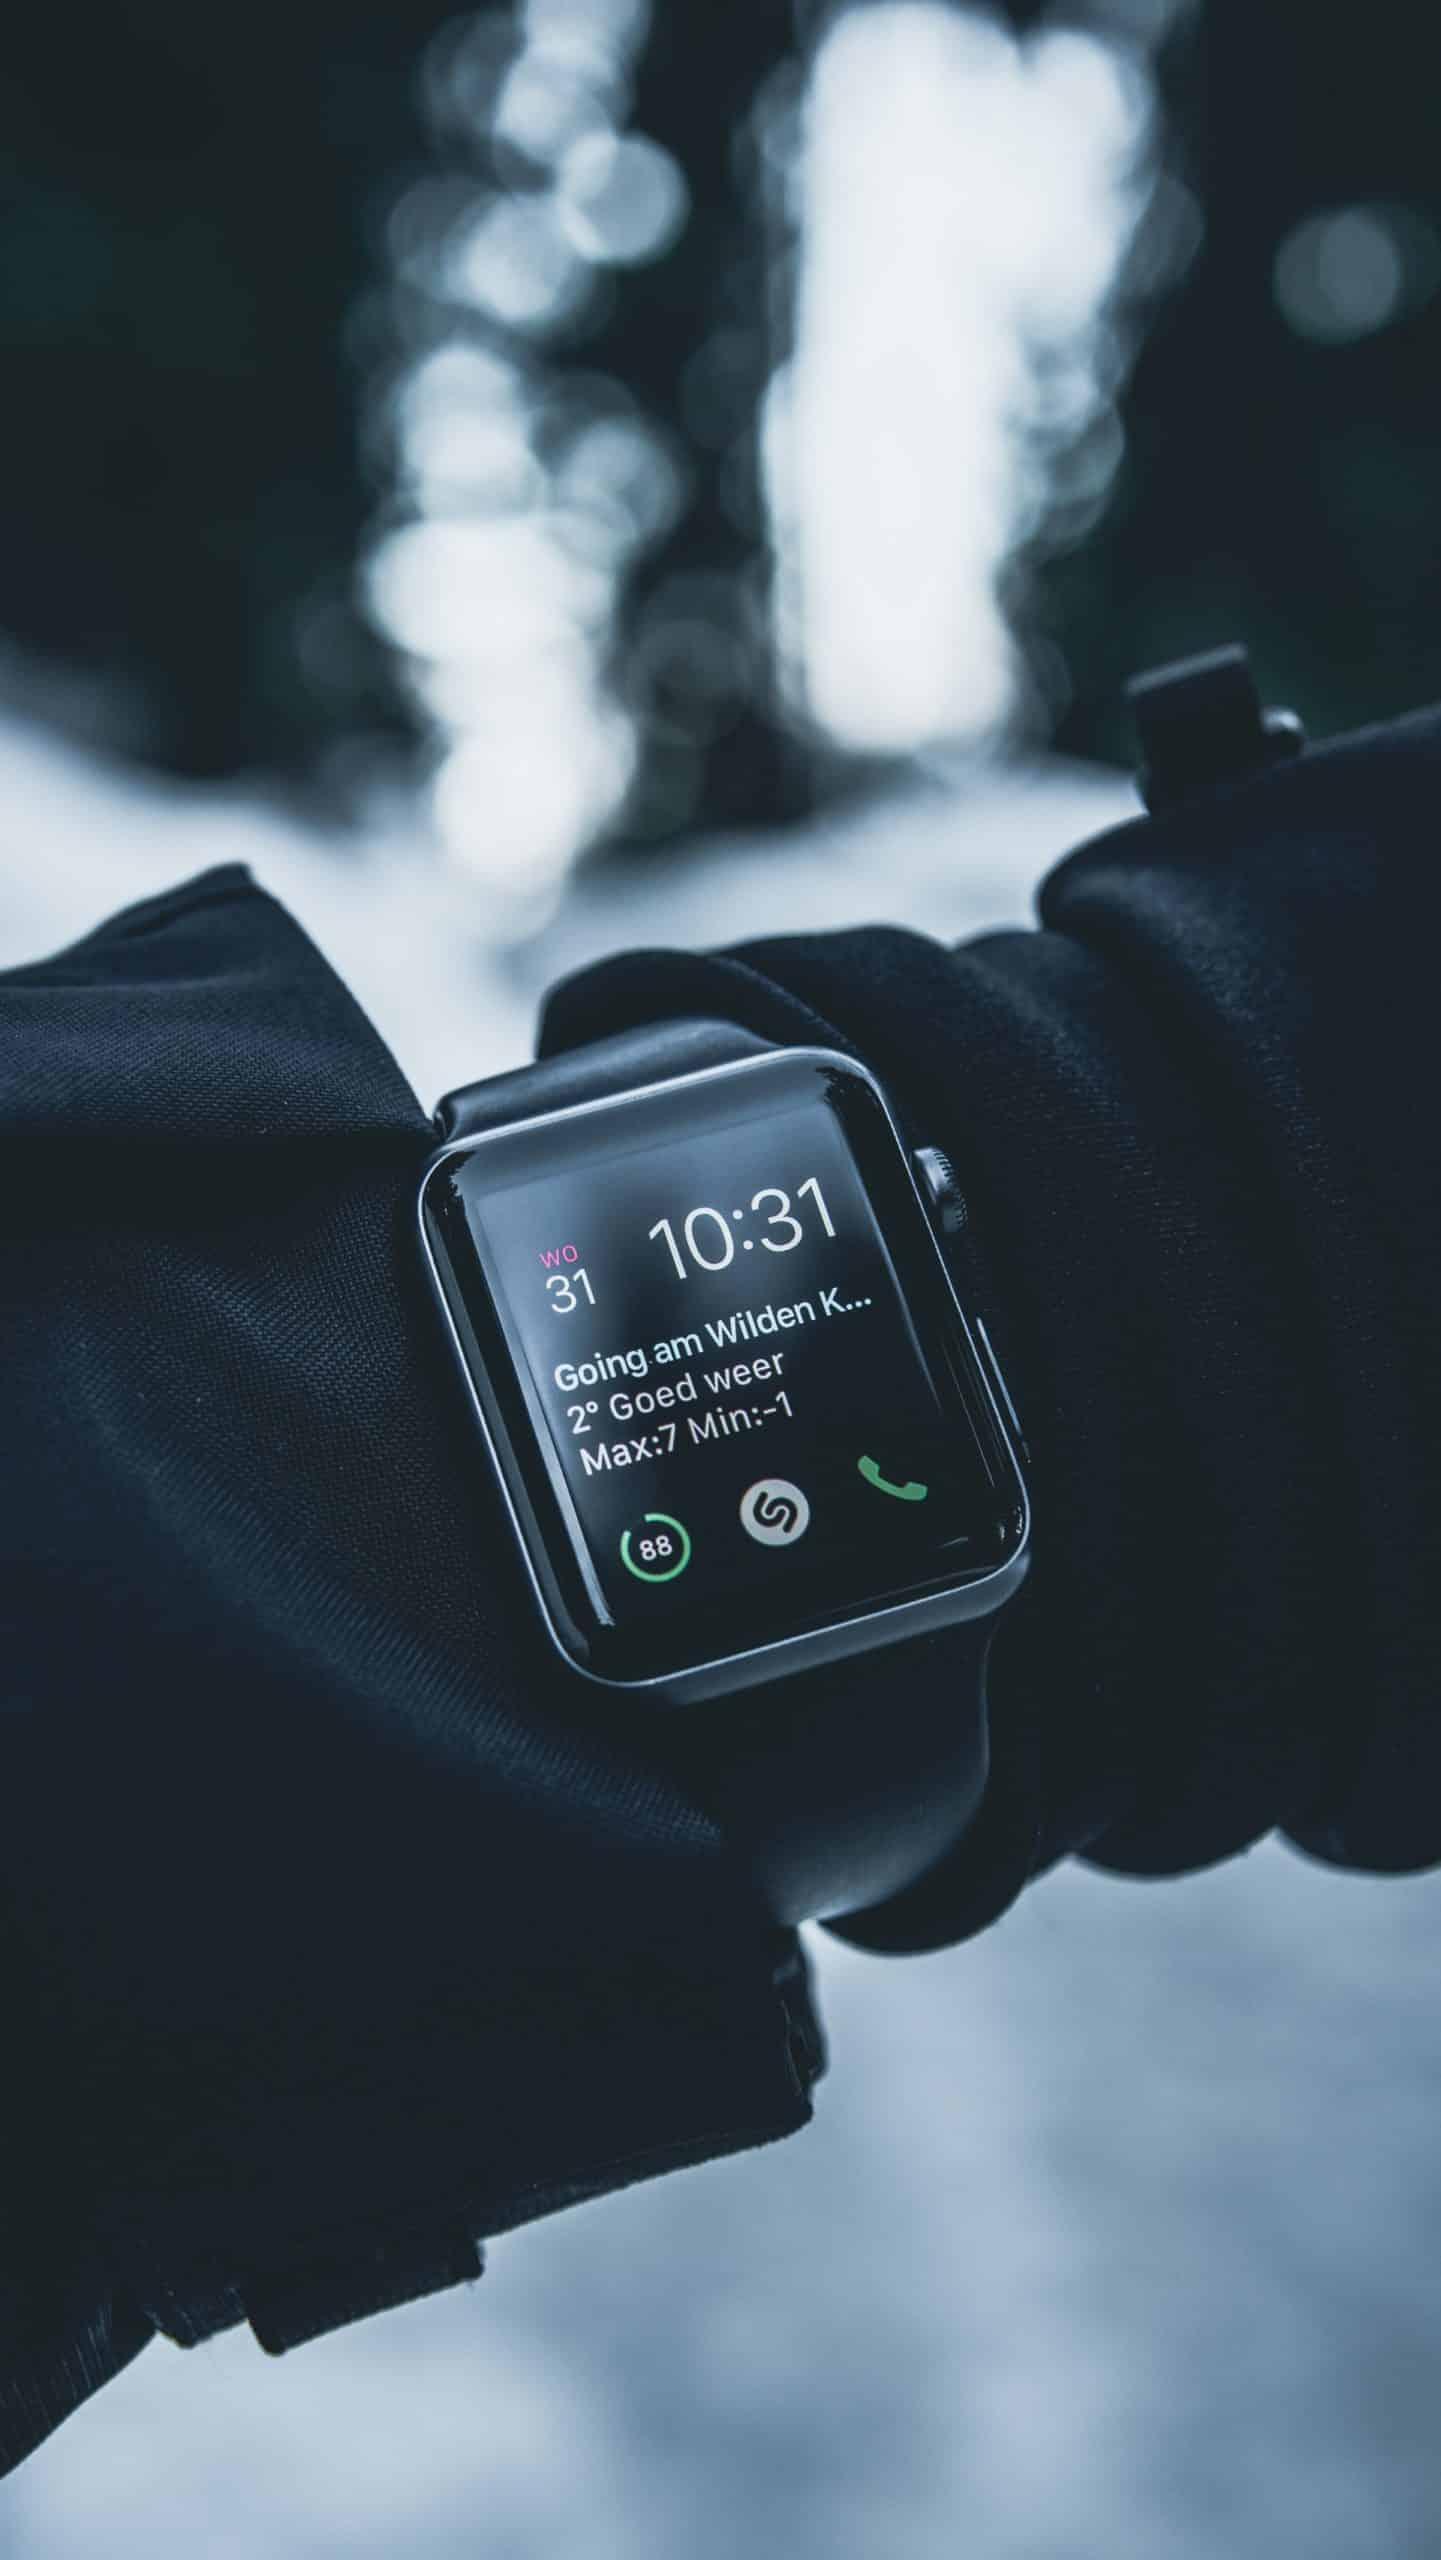 Smartwatch Sim Card Article Image